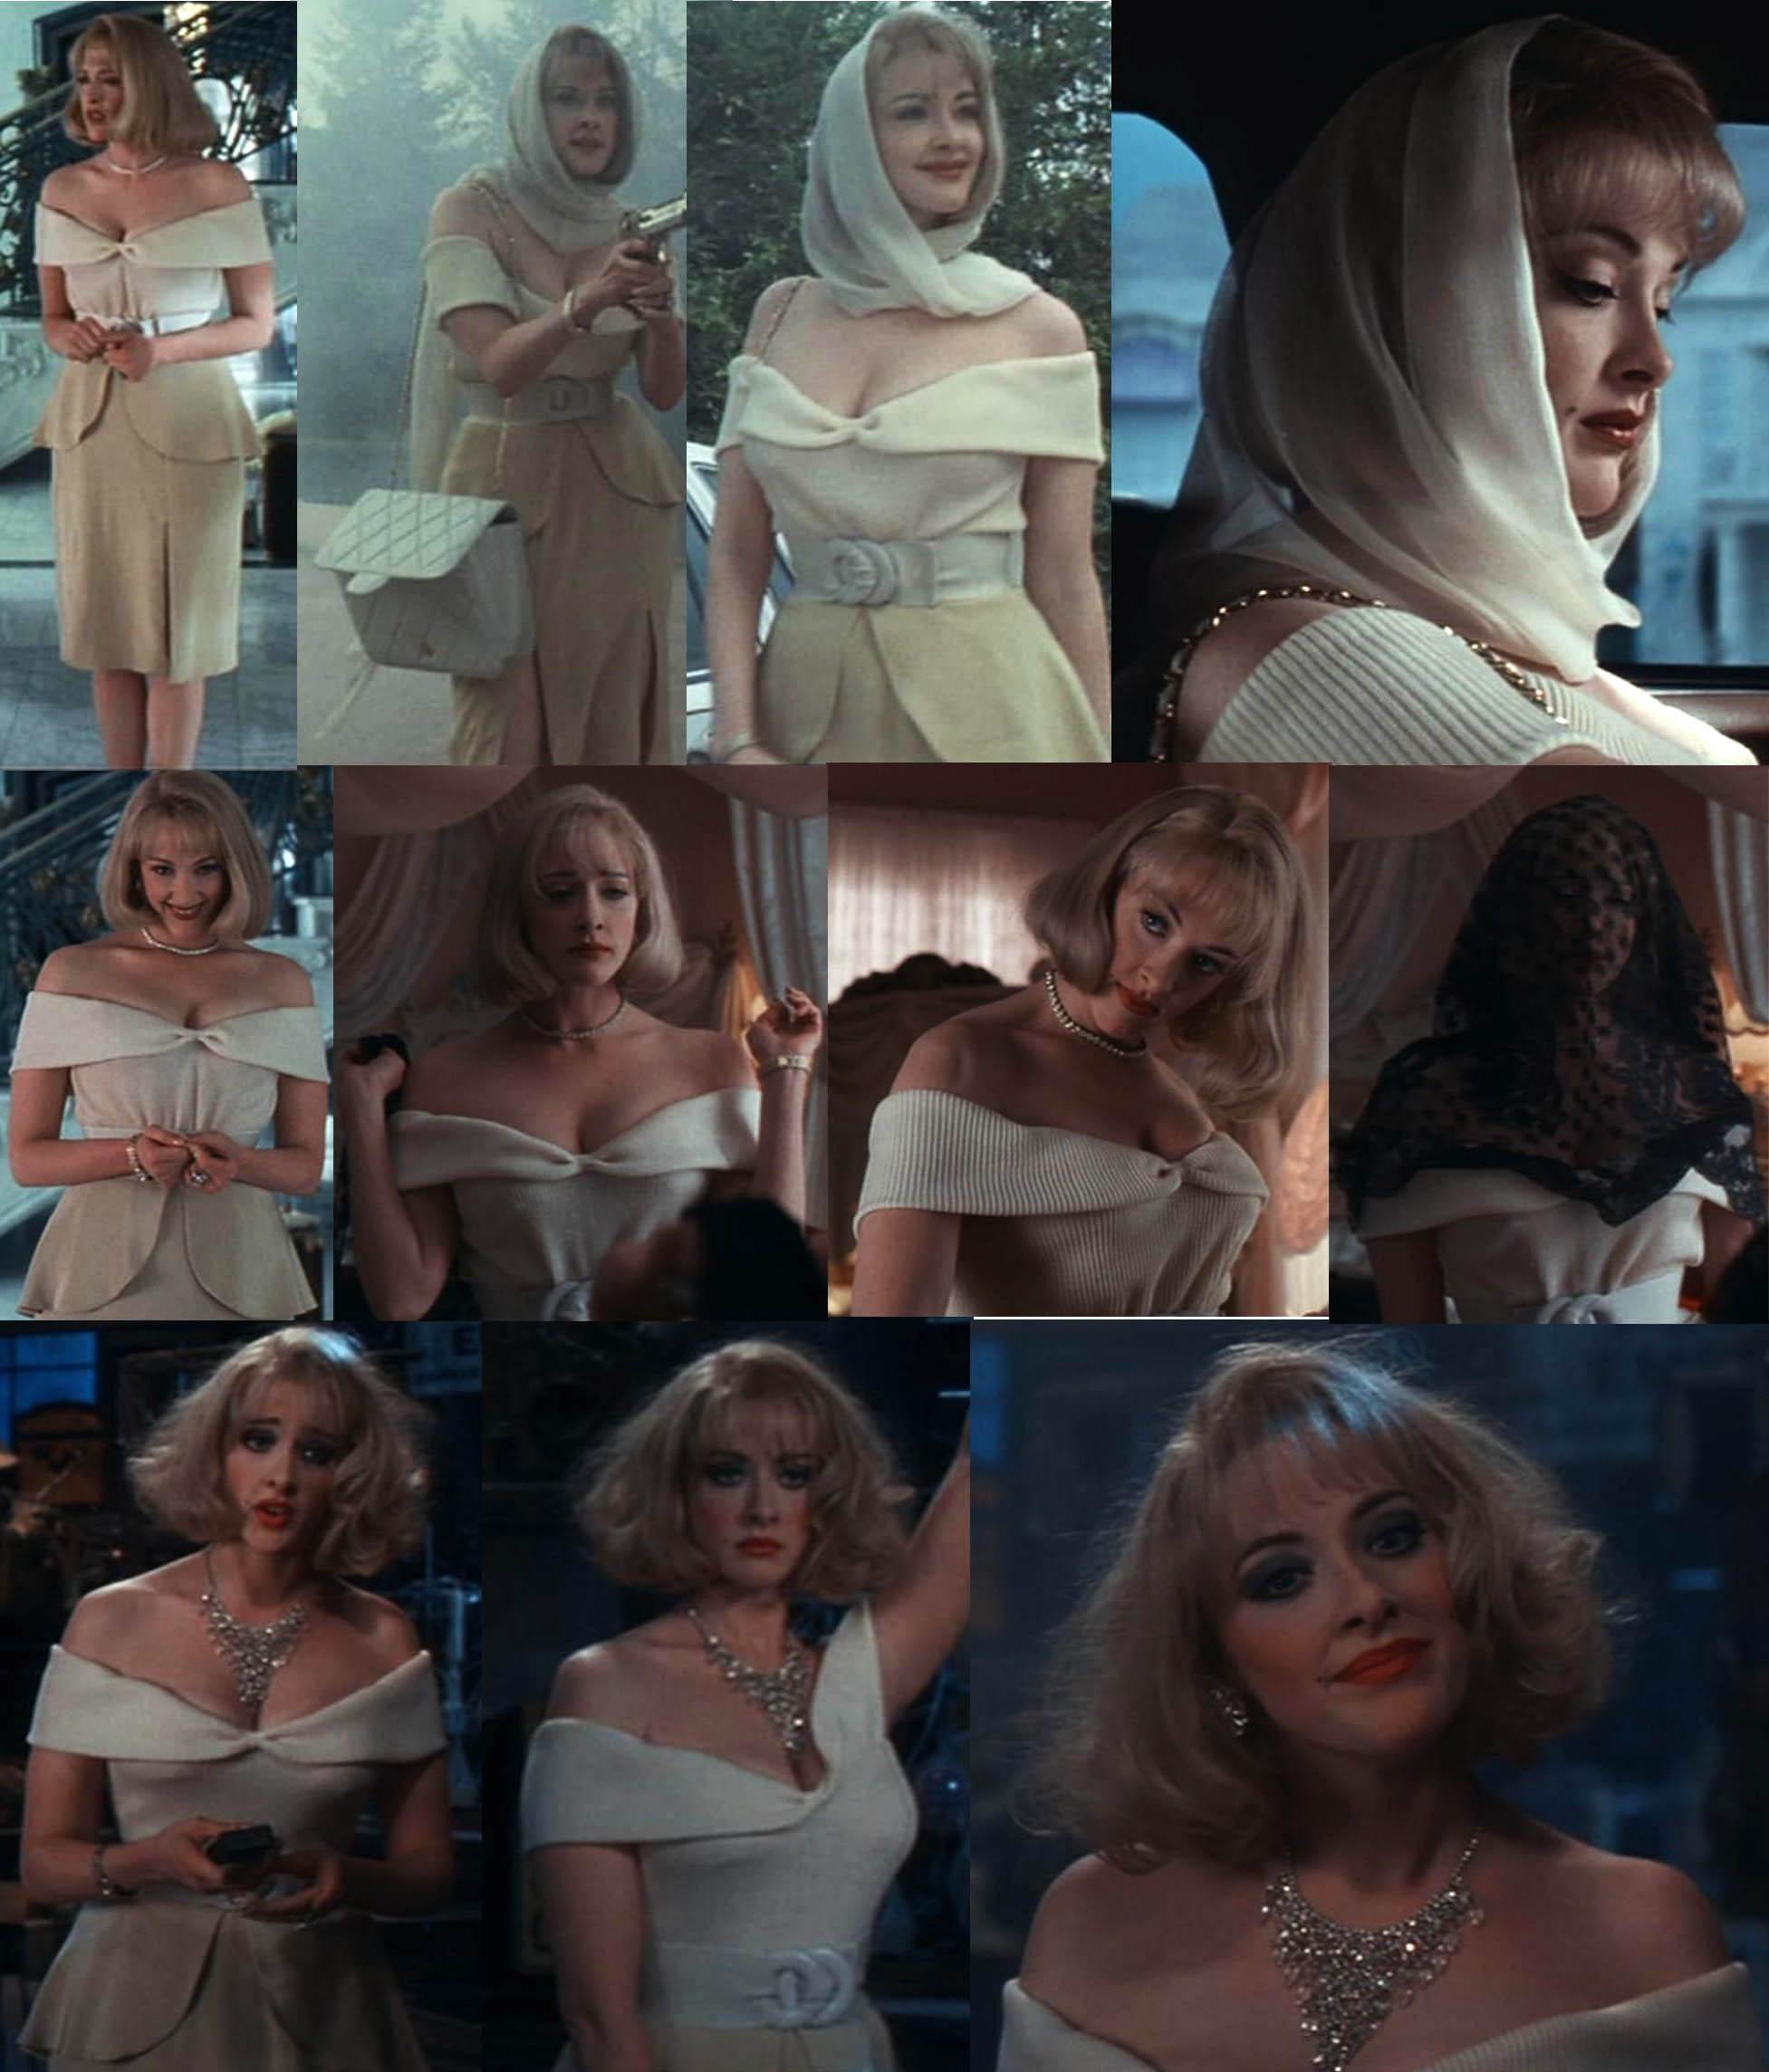 Addams Family Porn addams family values [1993] | addams family costumes, addams